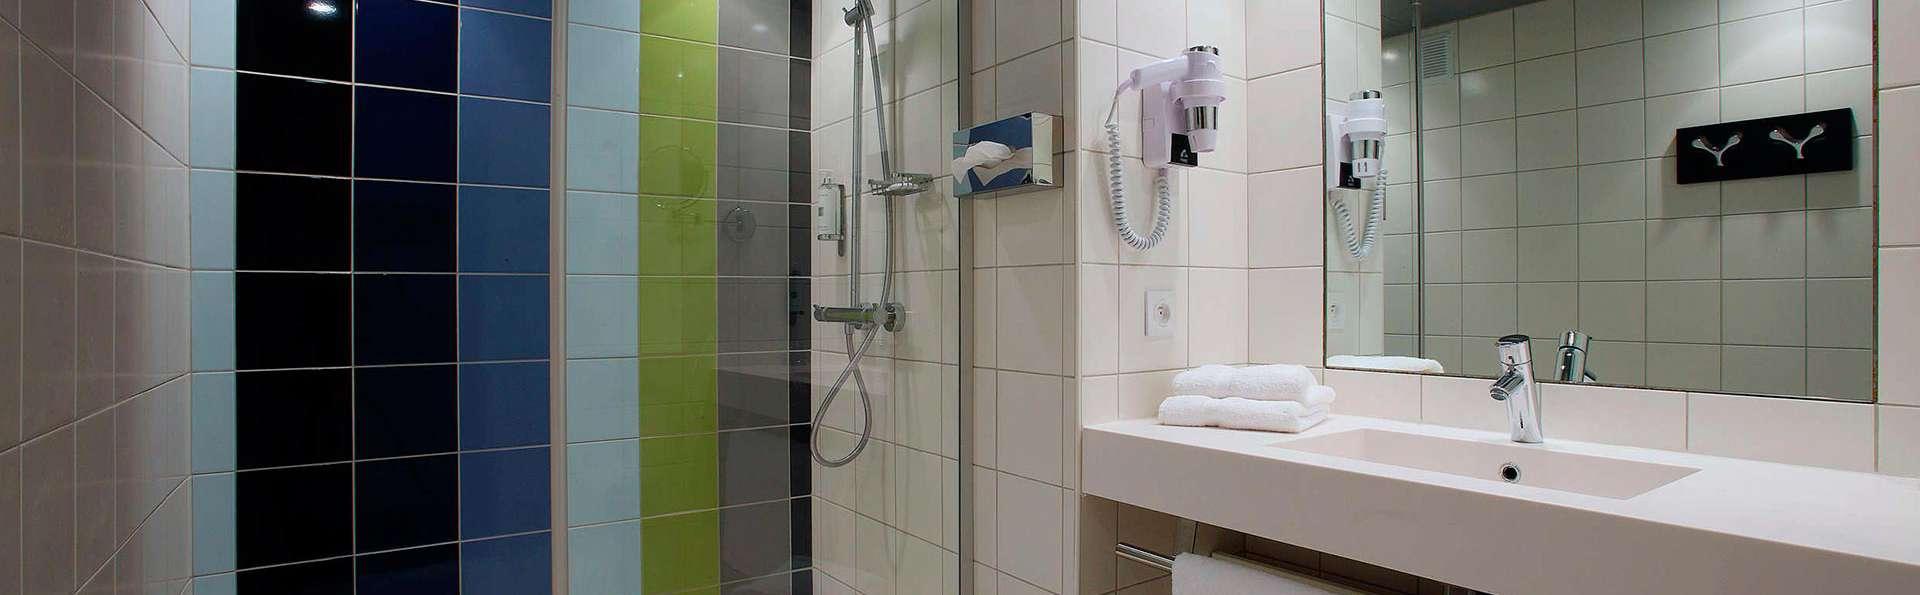 Hôtel le Cinq Hyper Centre Chambéry - edit_bathroom.jpg